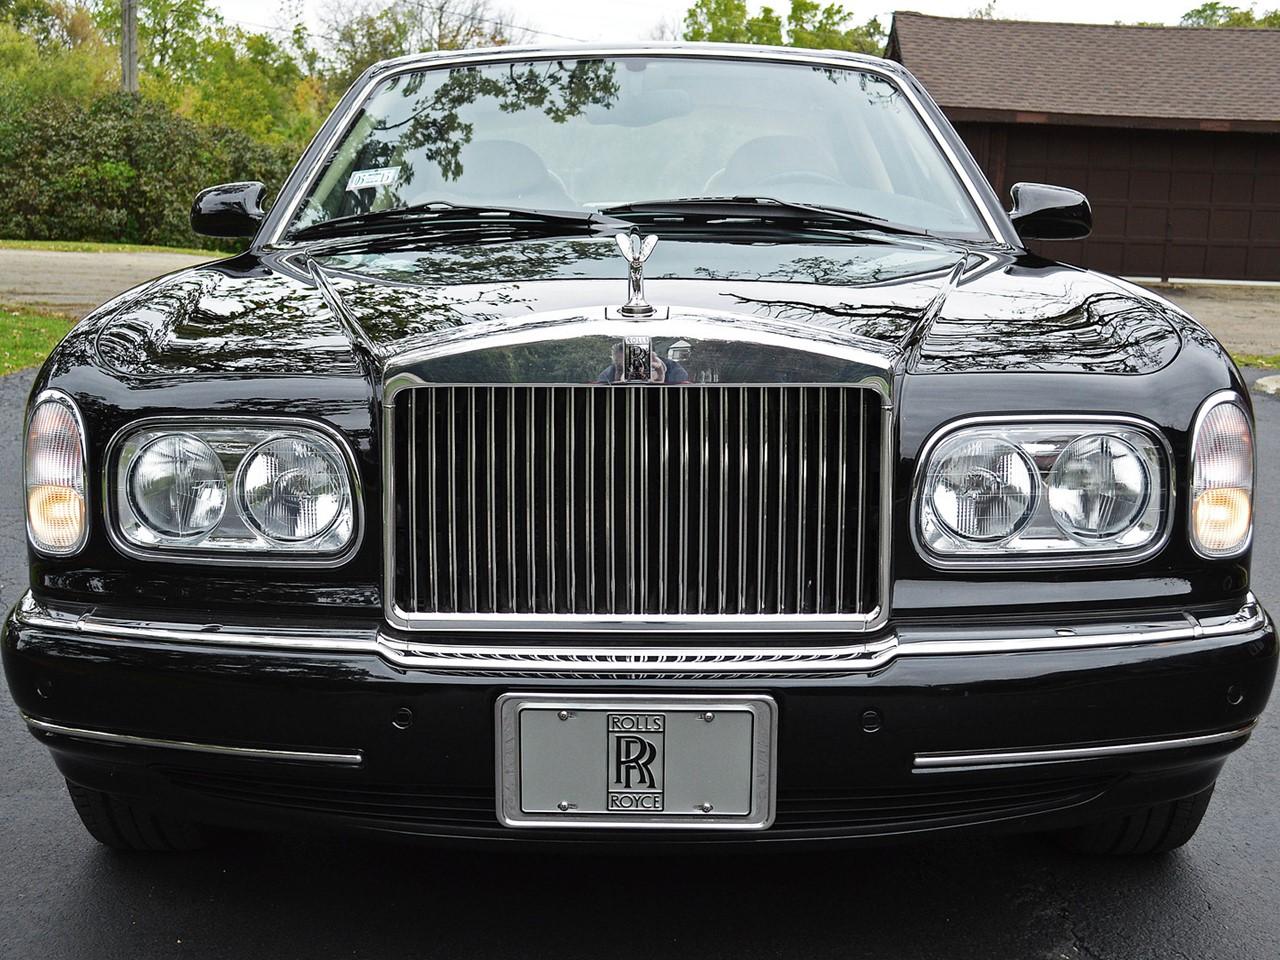 Rolls Royce Silver Seraph   NotoriousLuxury